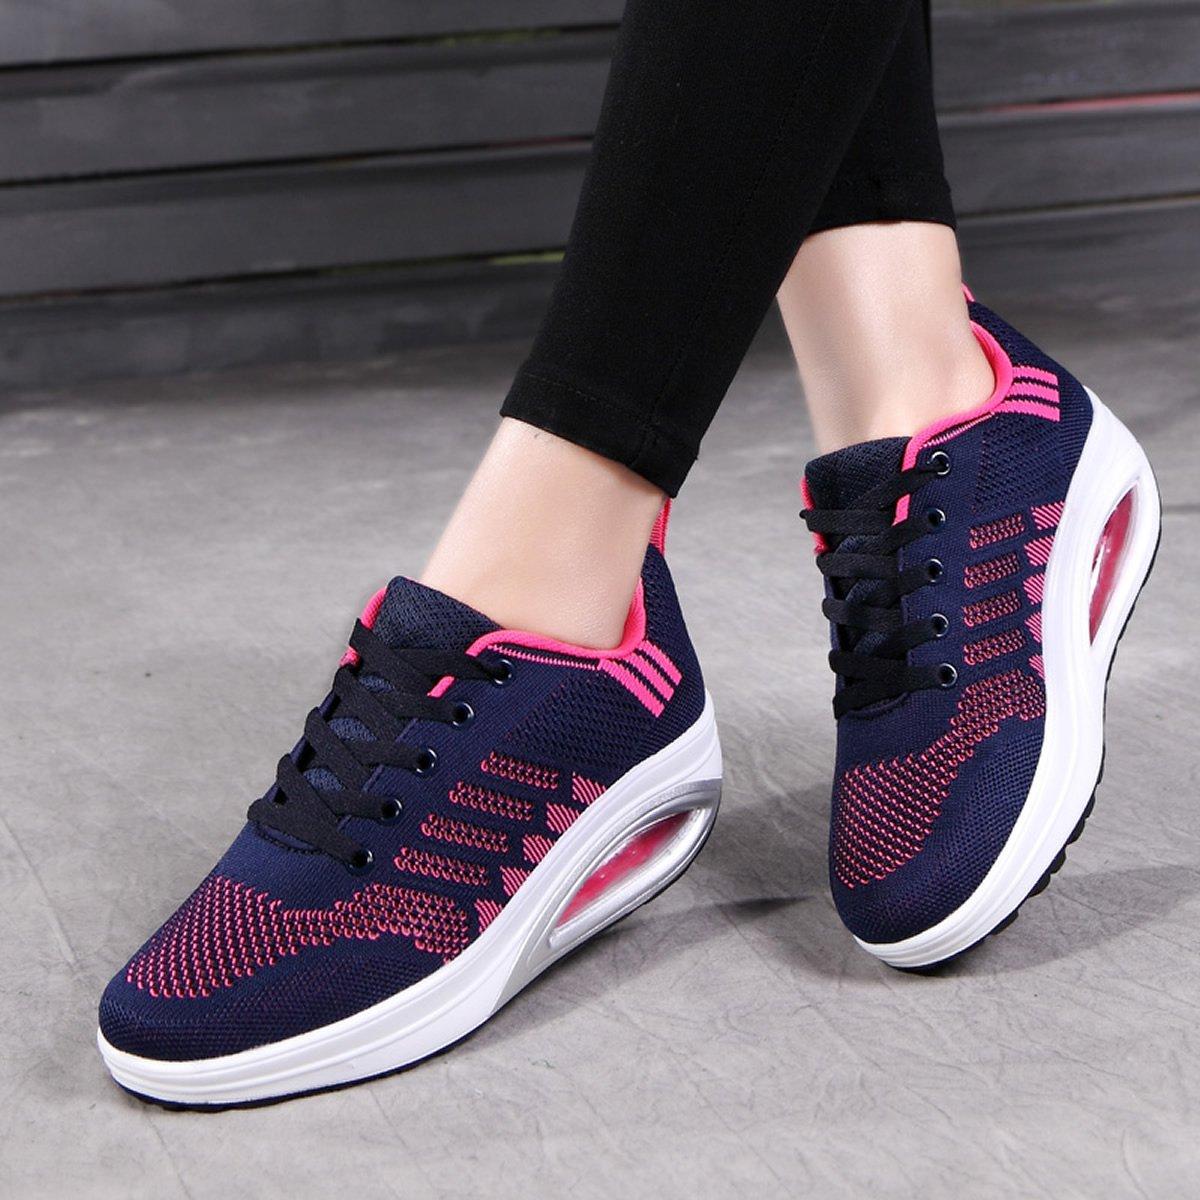 JARLIF Women's Comfortable Casual Platform Walking Sneakers Lightweight Casual Comfortable Tennis Air Fitness Shoes US5.5-10 B072B6GQBJ 5.5 B(M) Women / 5 D(M) Men / EU 36|Blue eb24e1